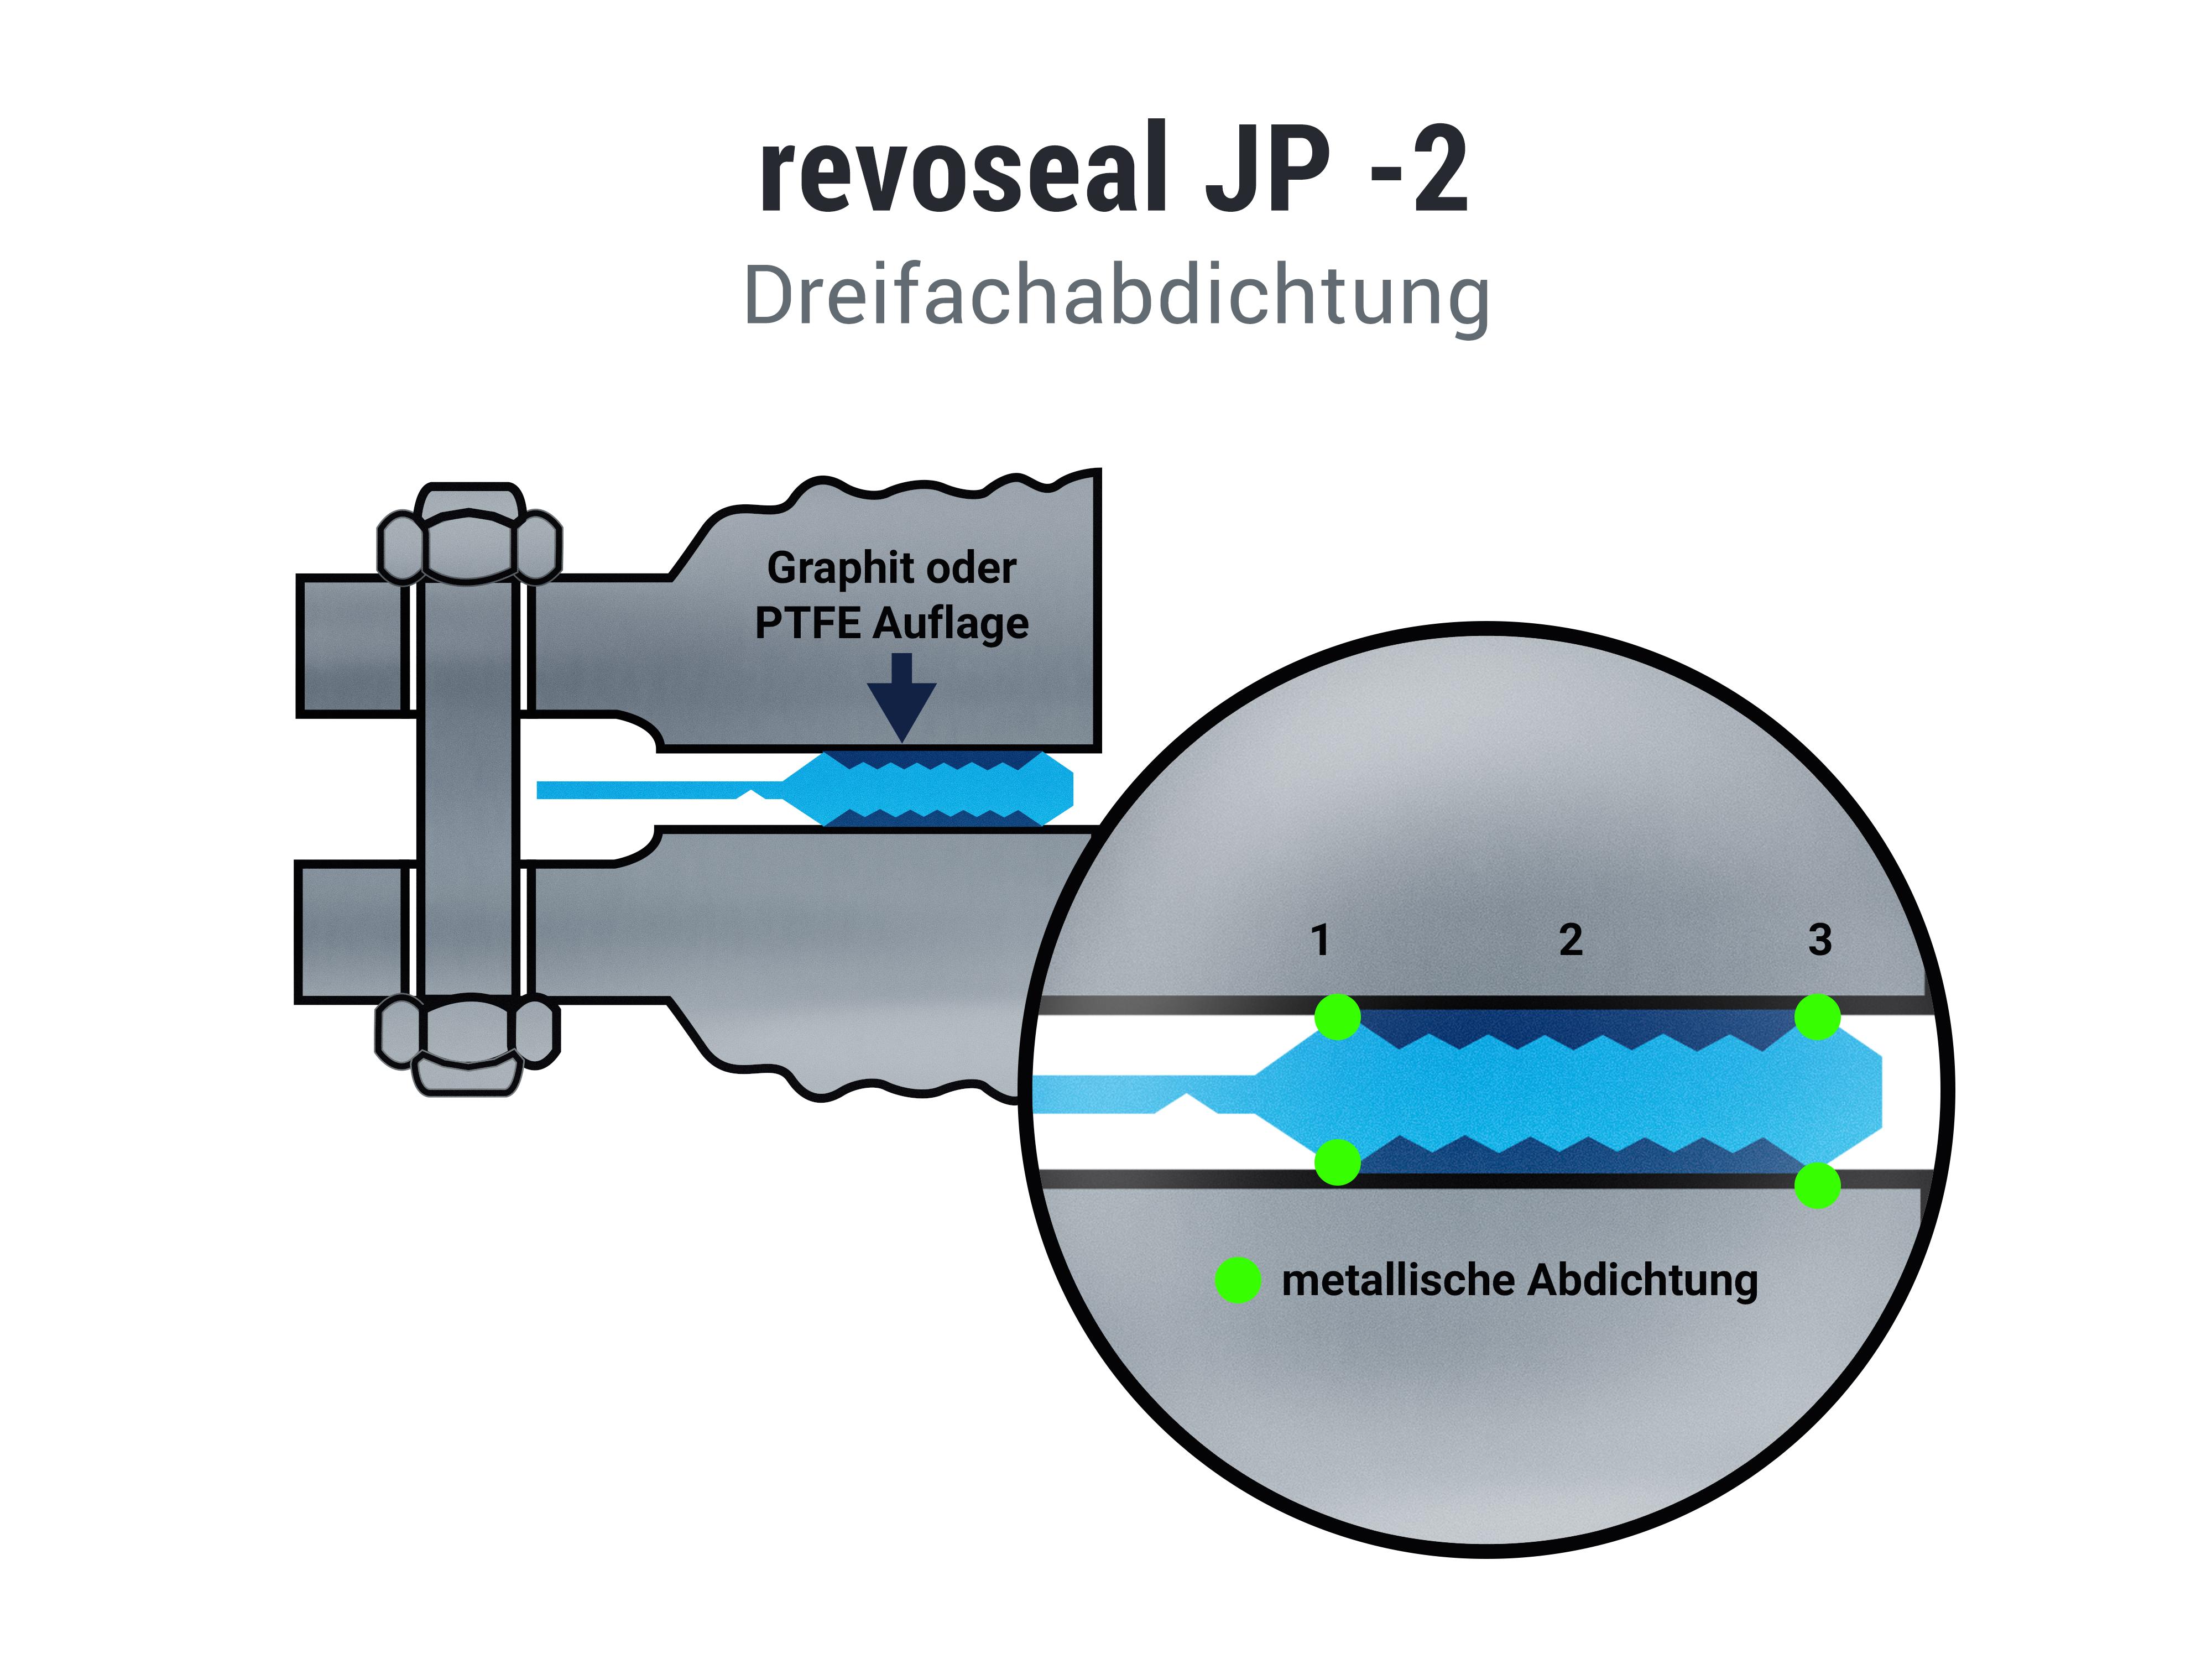 Jp2 - Dreifachabdichtung